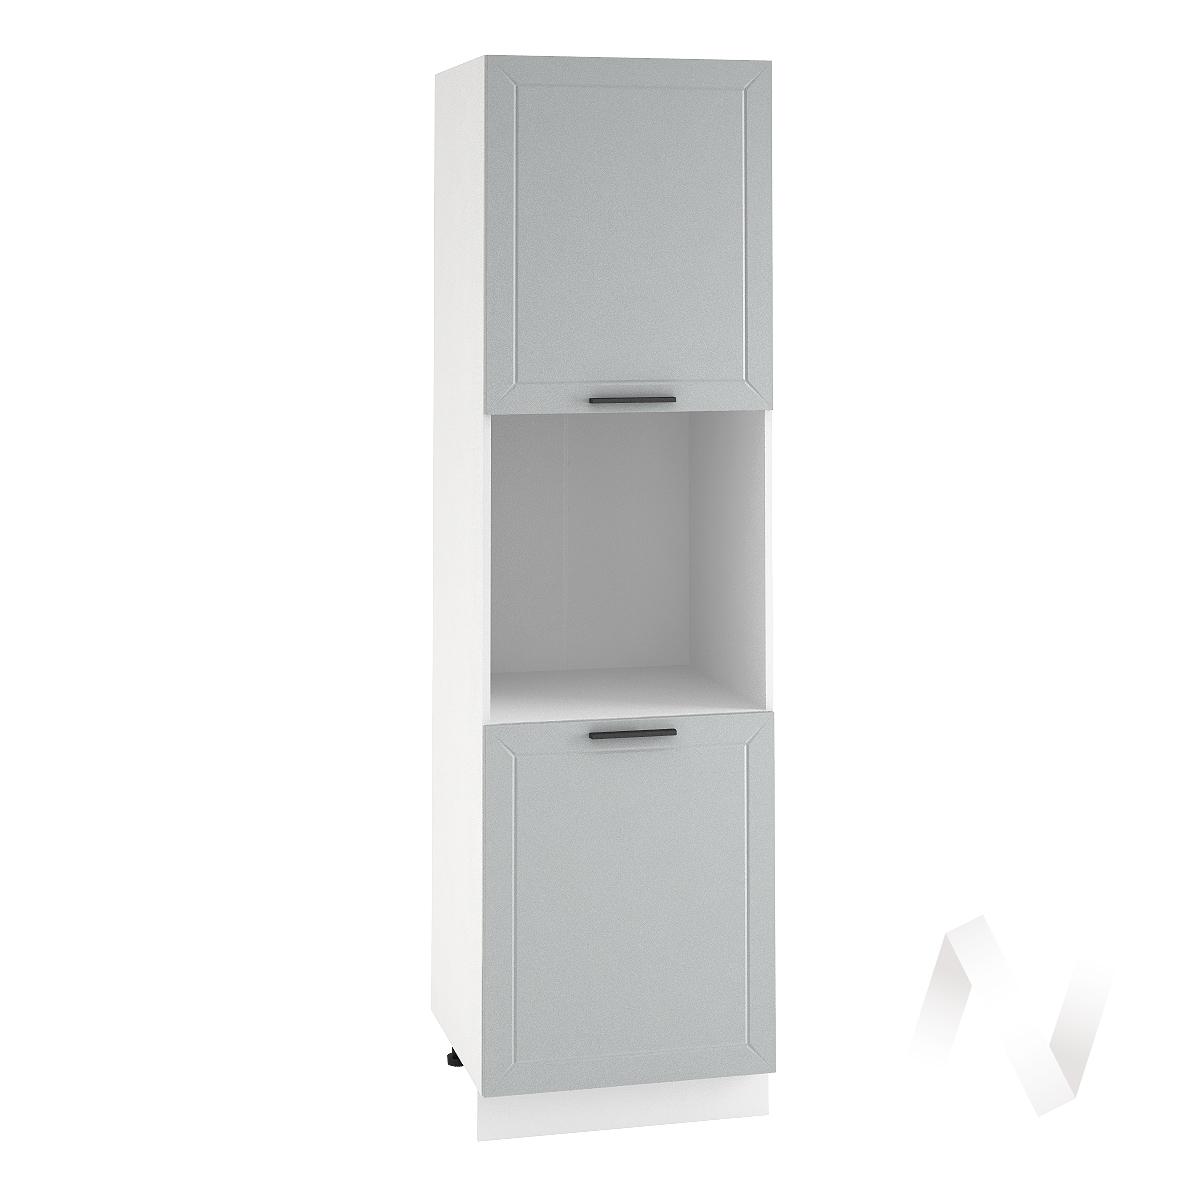 "Кухня ""Глетчер"": Шкаф пенал 600, ШП 600 (Гейнсборо Силк/корпус белый)"